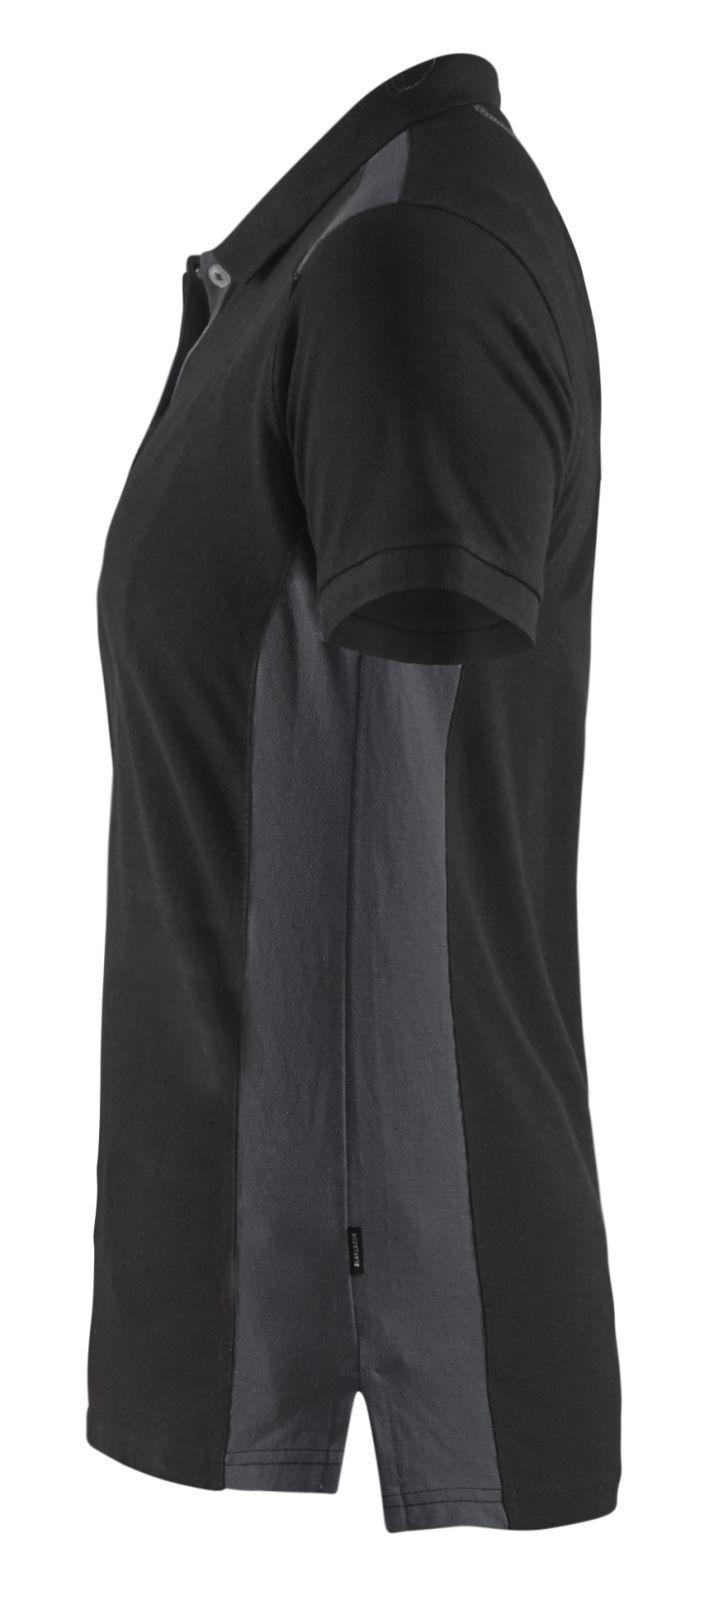 Blaklader Dames polo shirts 33901050 zwart-donkergrijs(9998)